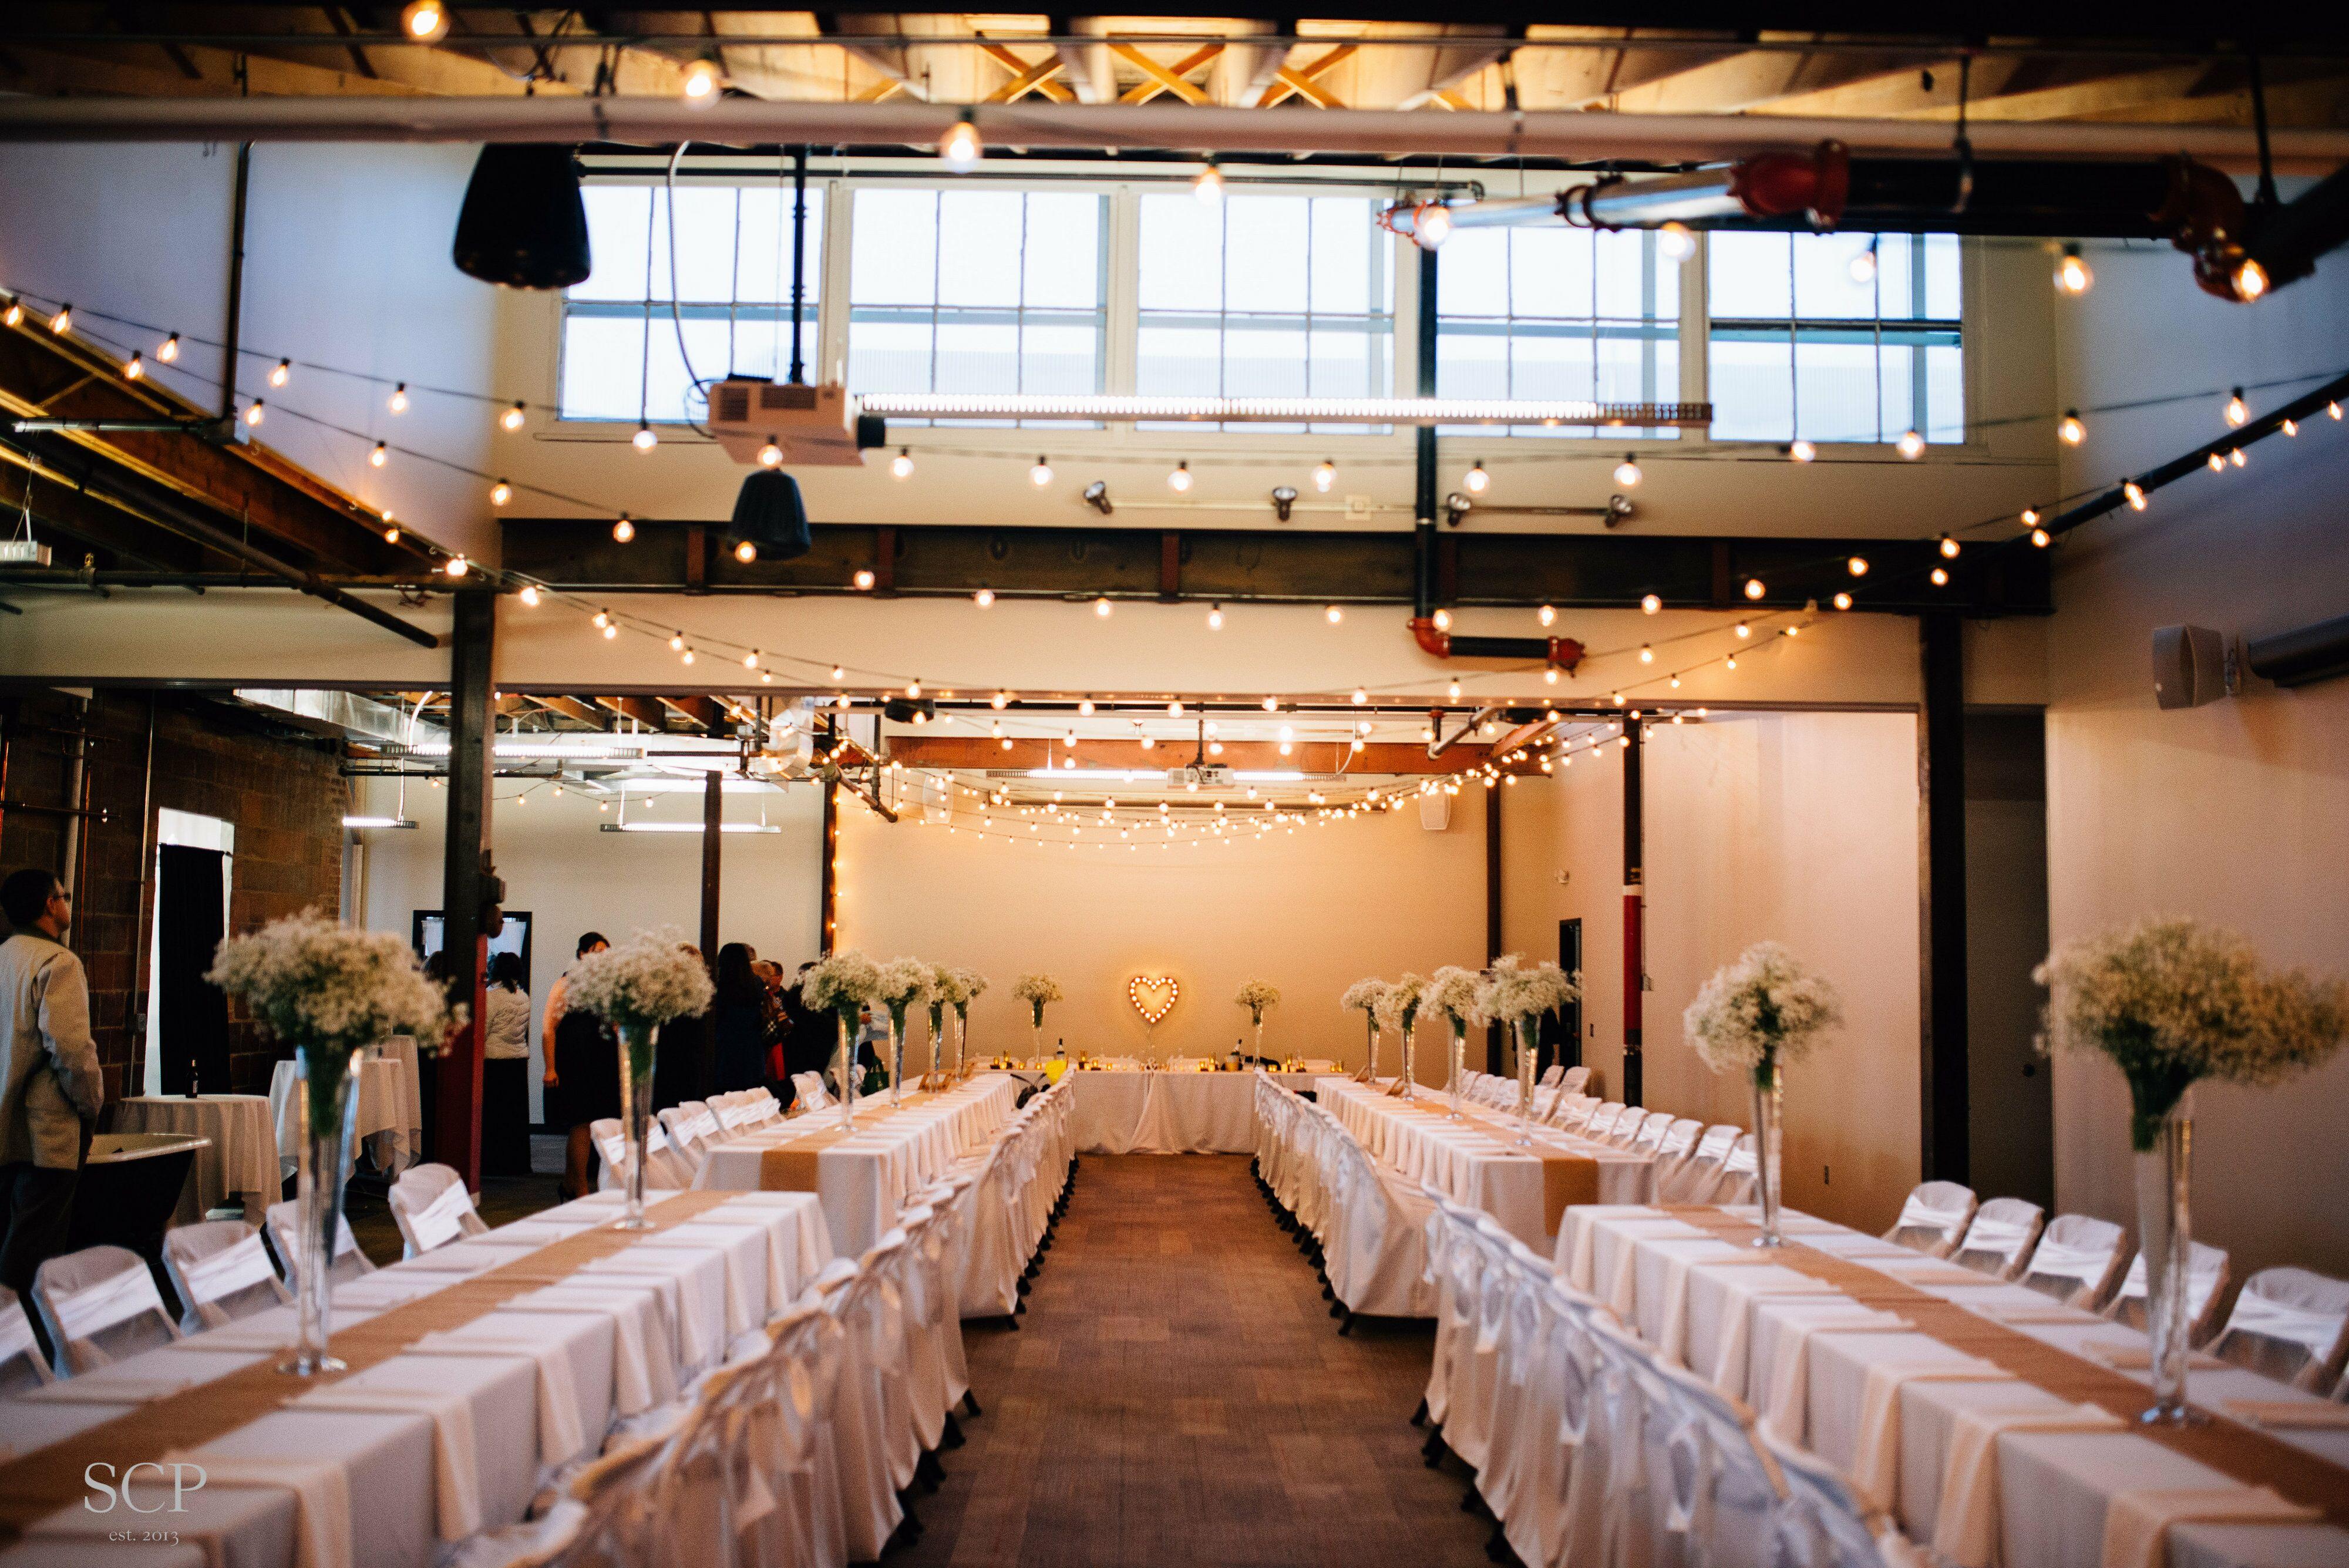 Wedding ceremony venues omaha ne